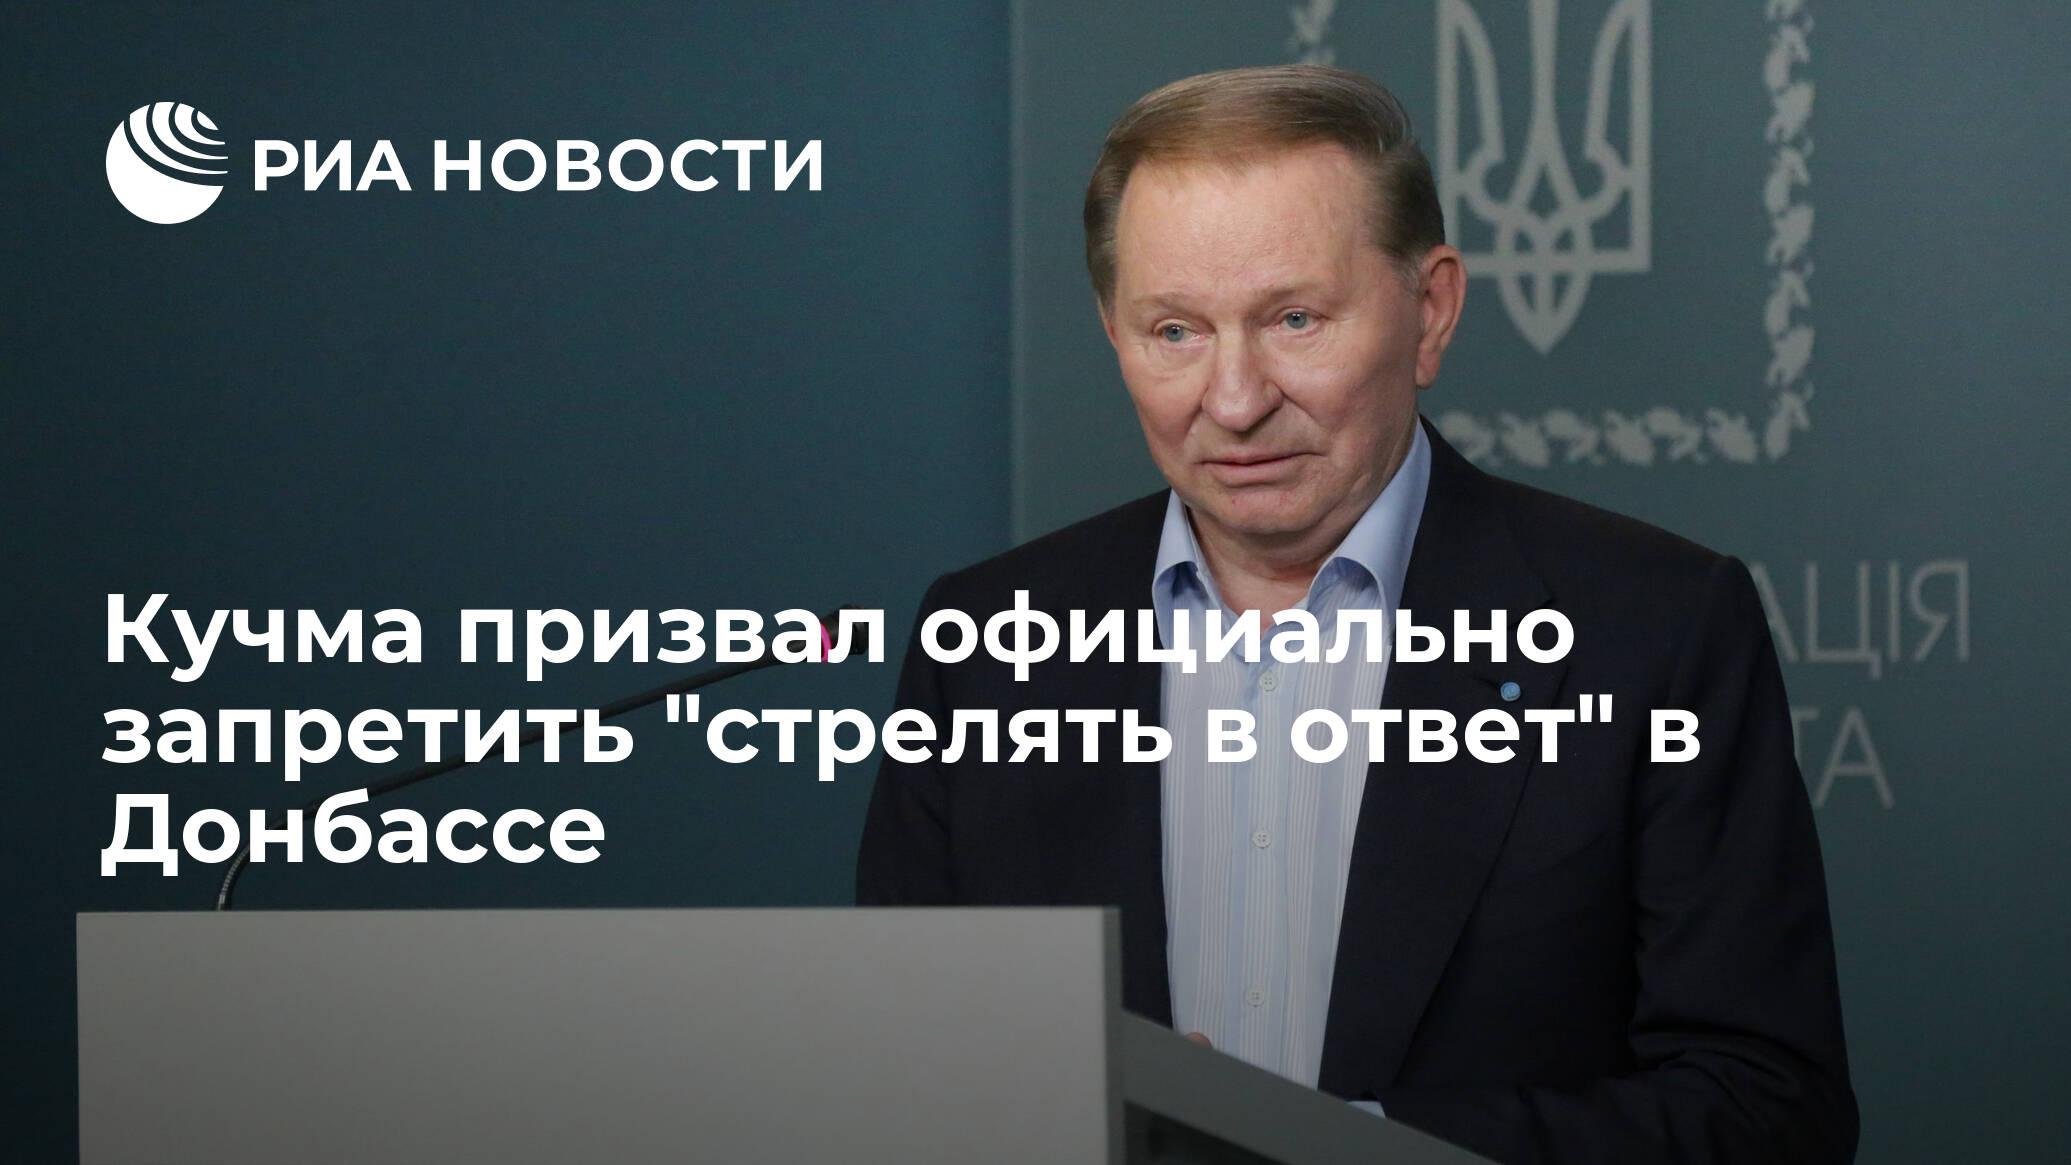 https://cdn25.img.ria.ru/images/sharing/article/1555312565.jpg